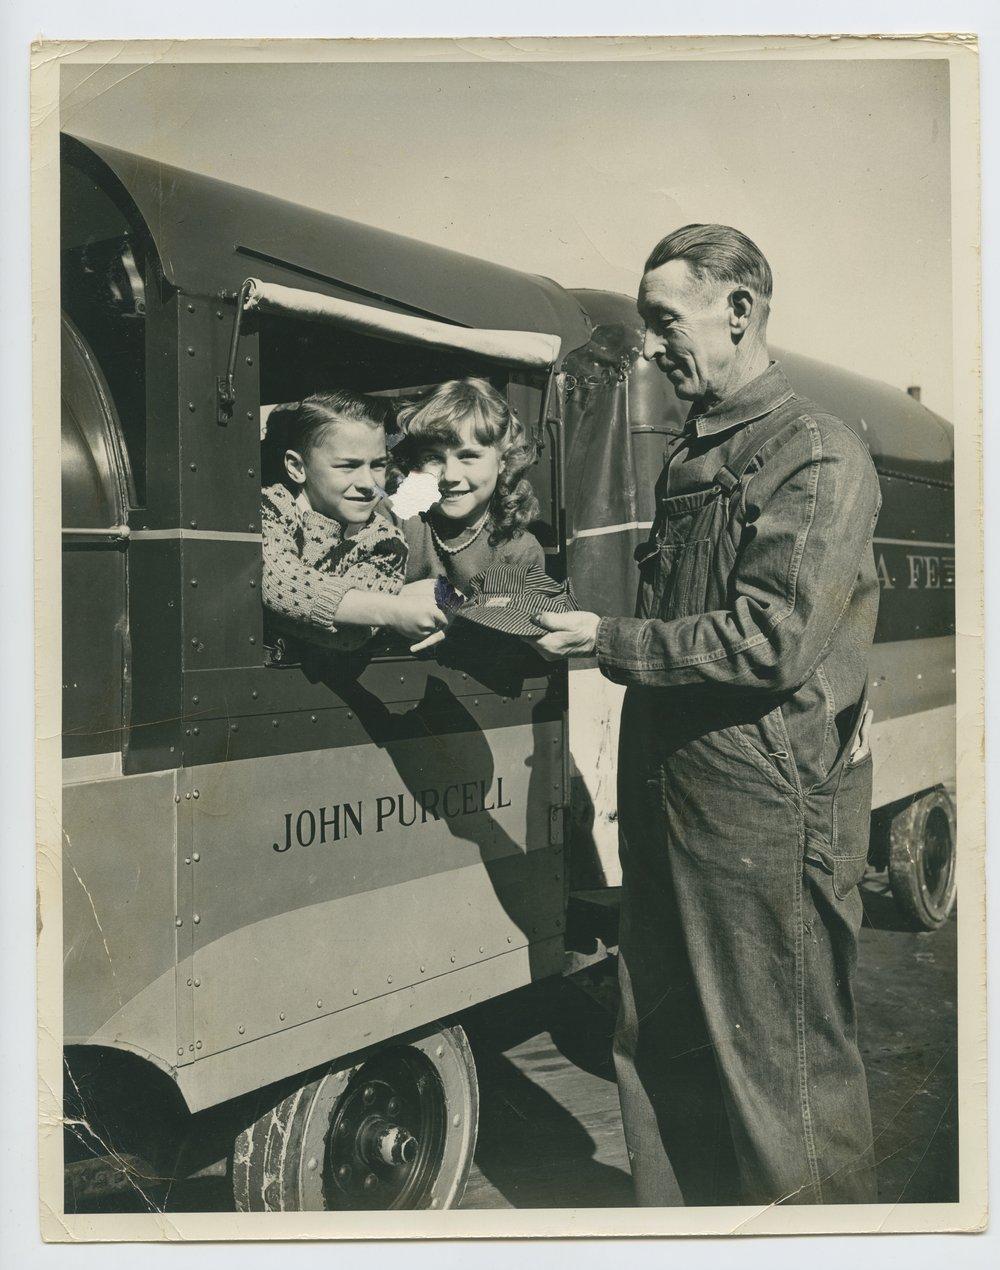 Atchison, Topeka & Santa Fe Railway's miniature train and the engineer Merle A. Benson - 10